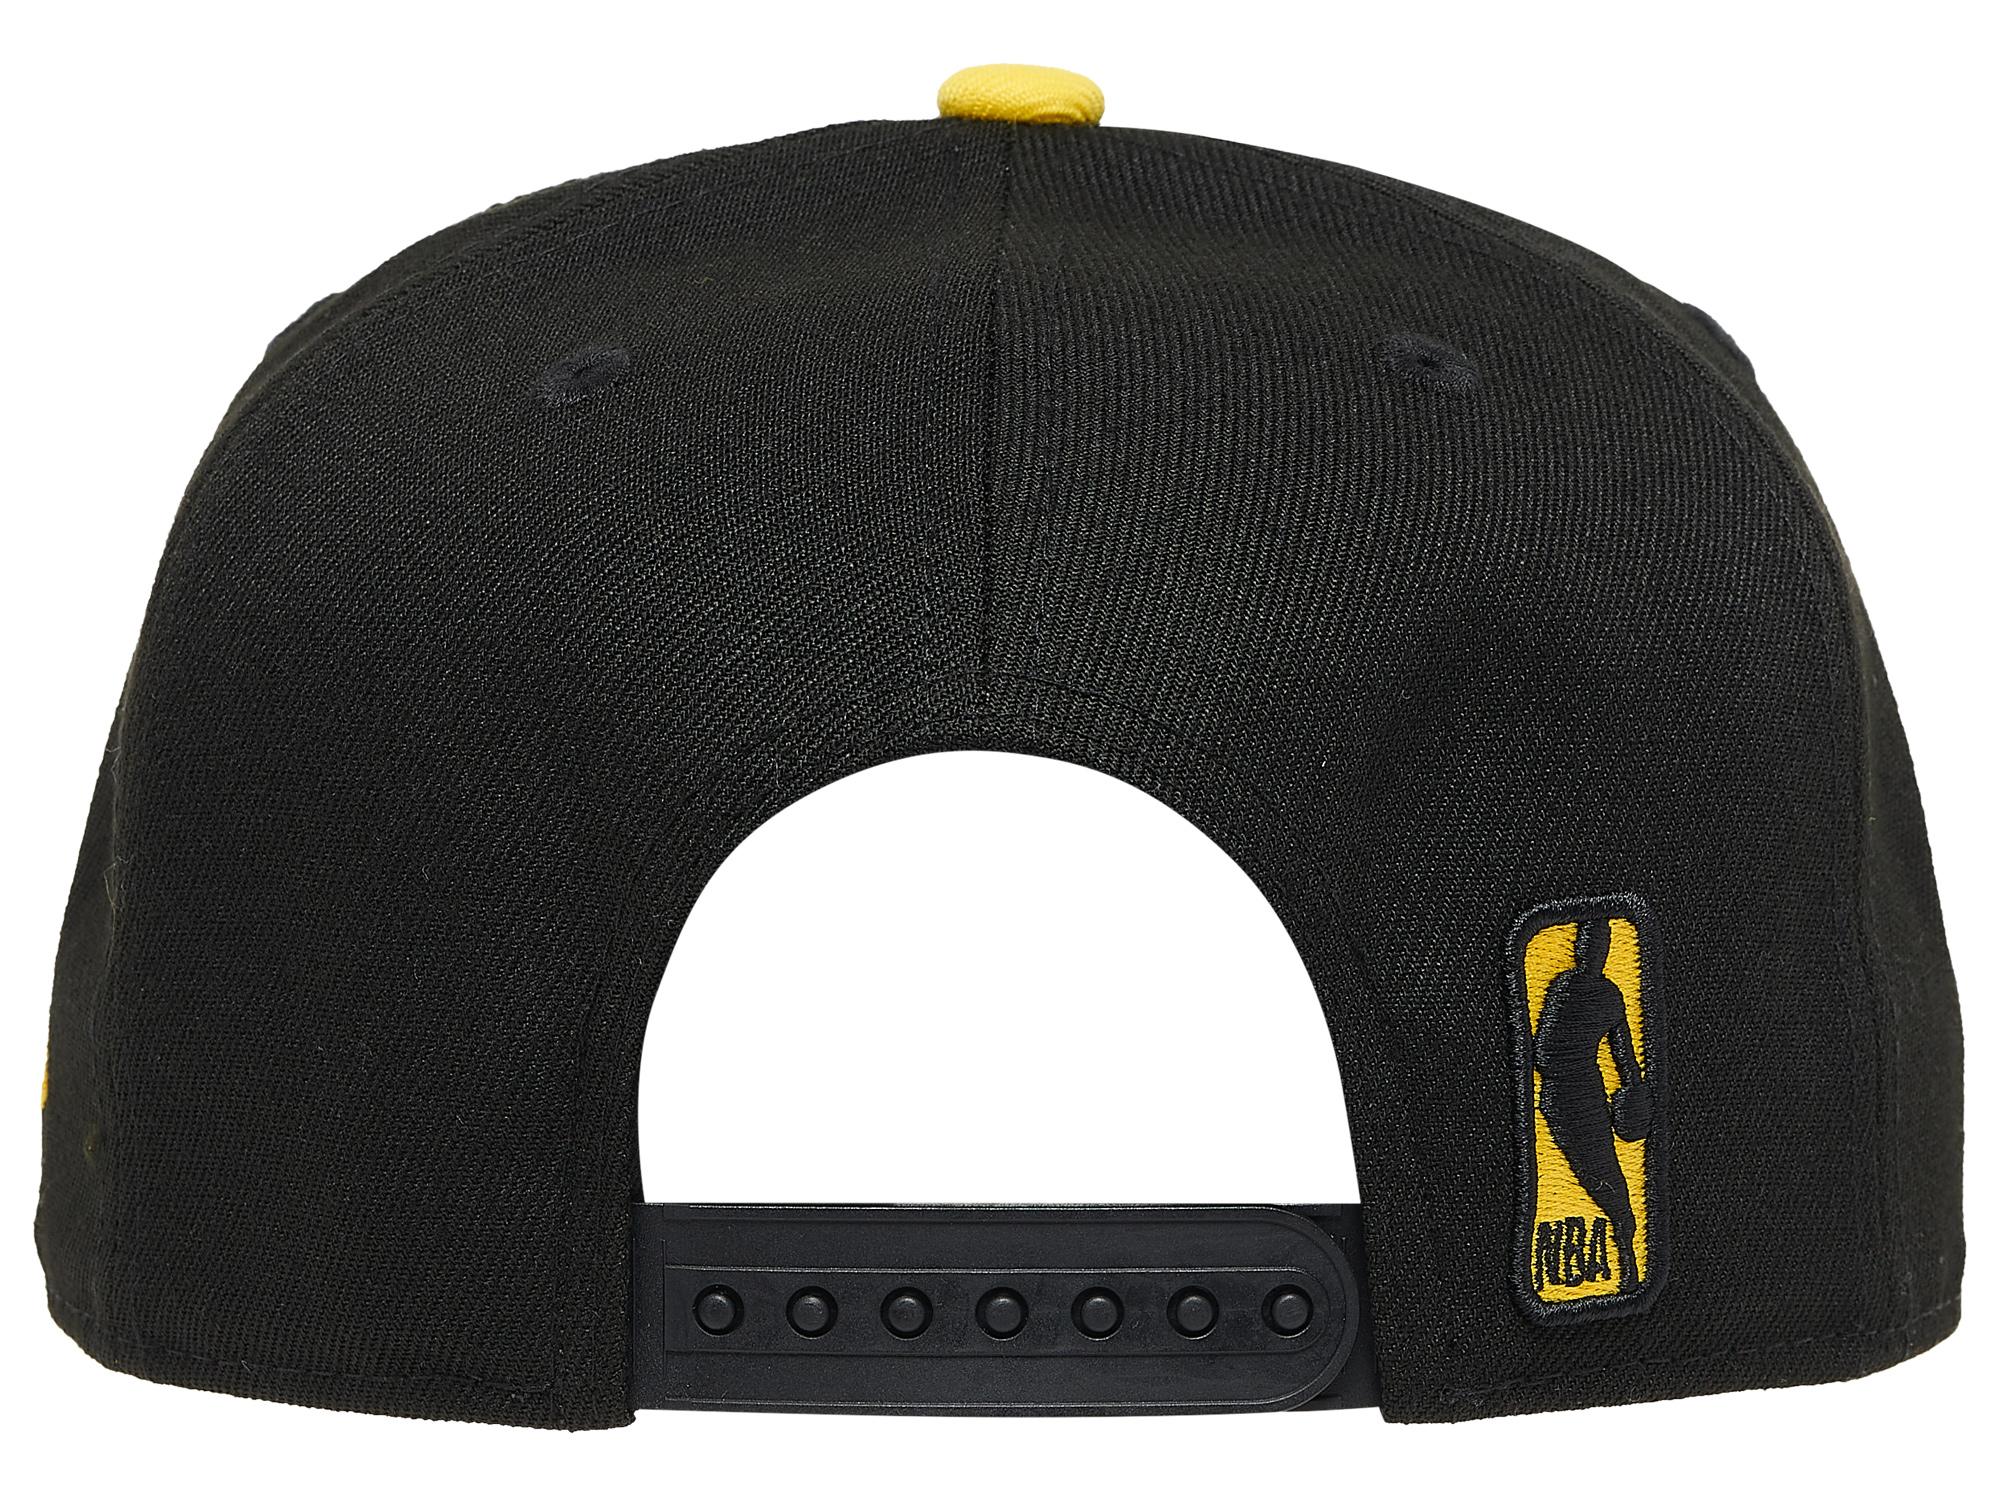 jordan-4-lightning-new-era-bulls-yellow-black-snapback-cap-2